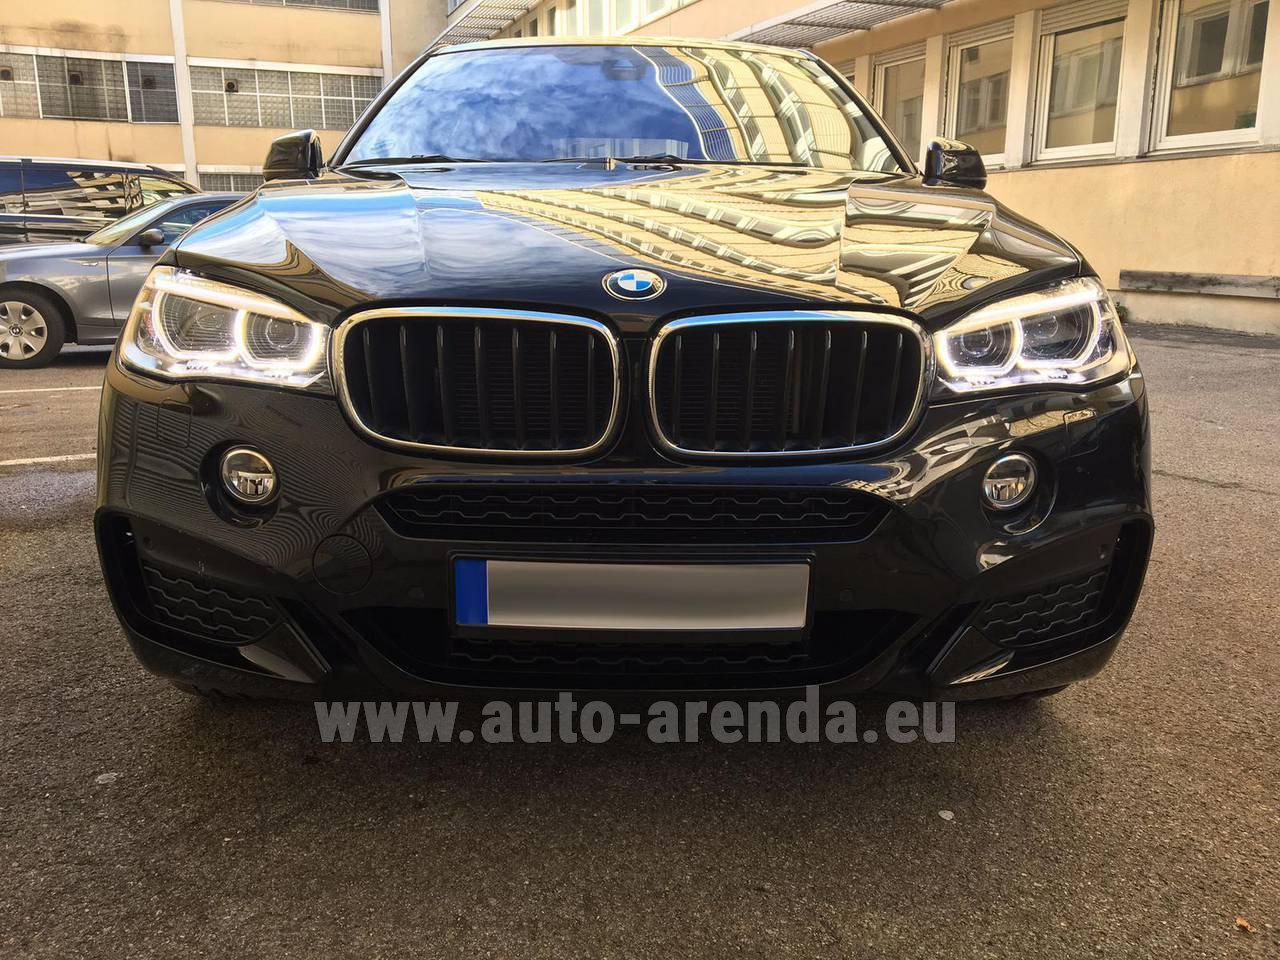 Rent Bmw X6 3 0d Xdrive High Executive M Sport In Salzburg